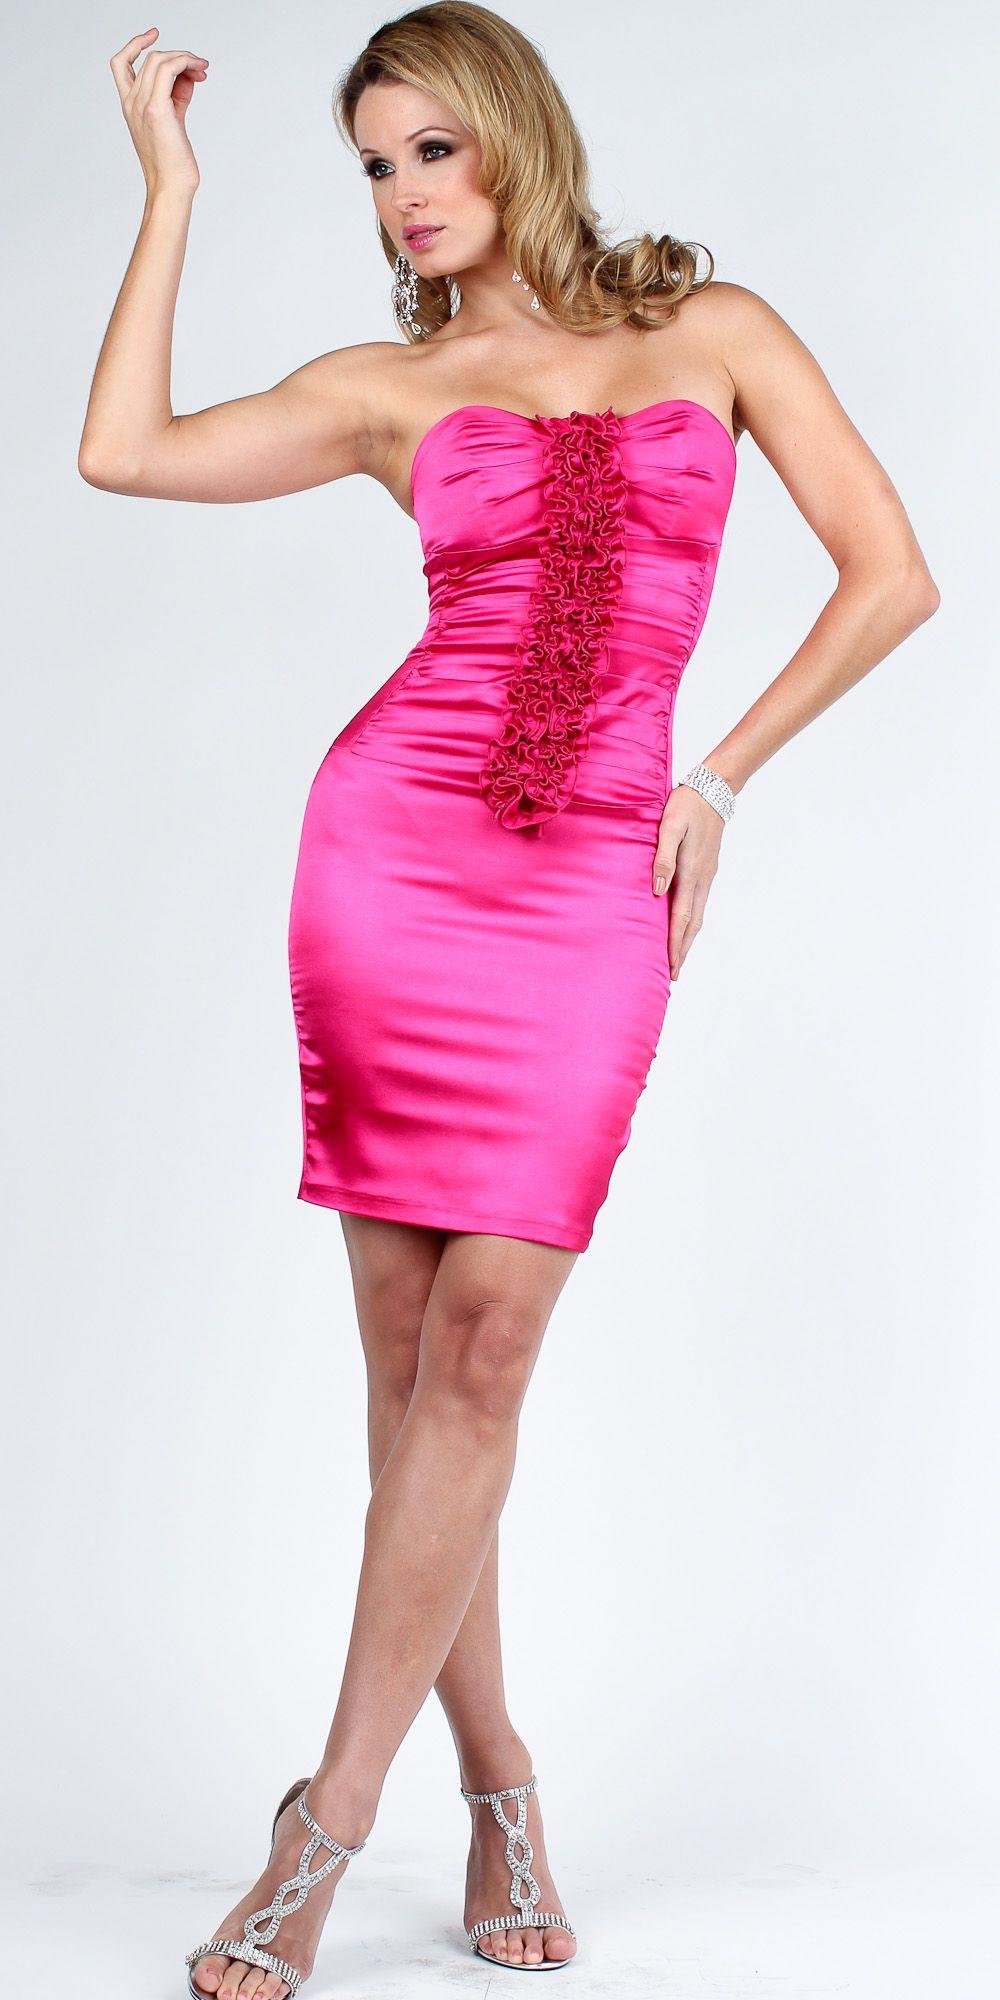 Hot pink bridesmaid dress weddings pinterest hot pink hot pink bridesmaid dress ombrellifo Gallery